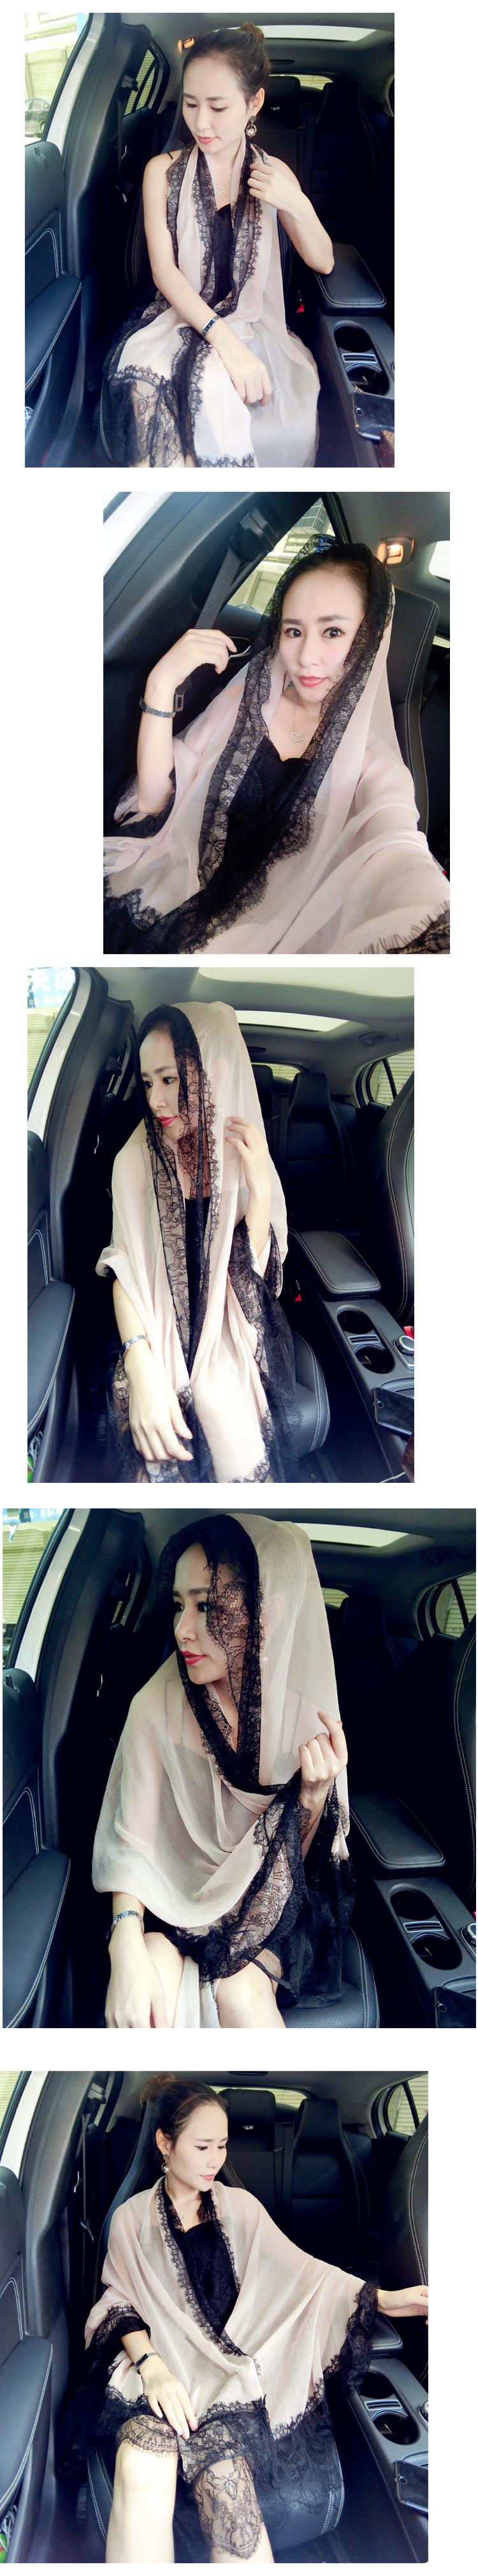 200x100cm Natural Silk Chiffon Lace Scarves Woman Winter Long Solid Brand Scarf Fourlard Pareol Hijab Echarpe Islam Shawls S6